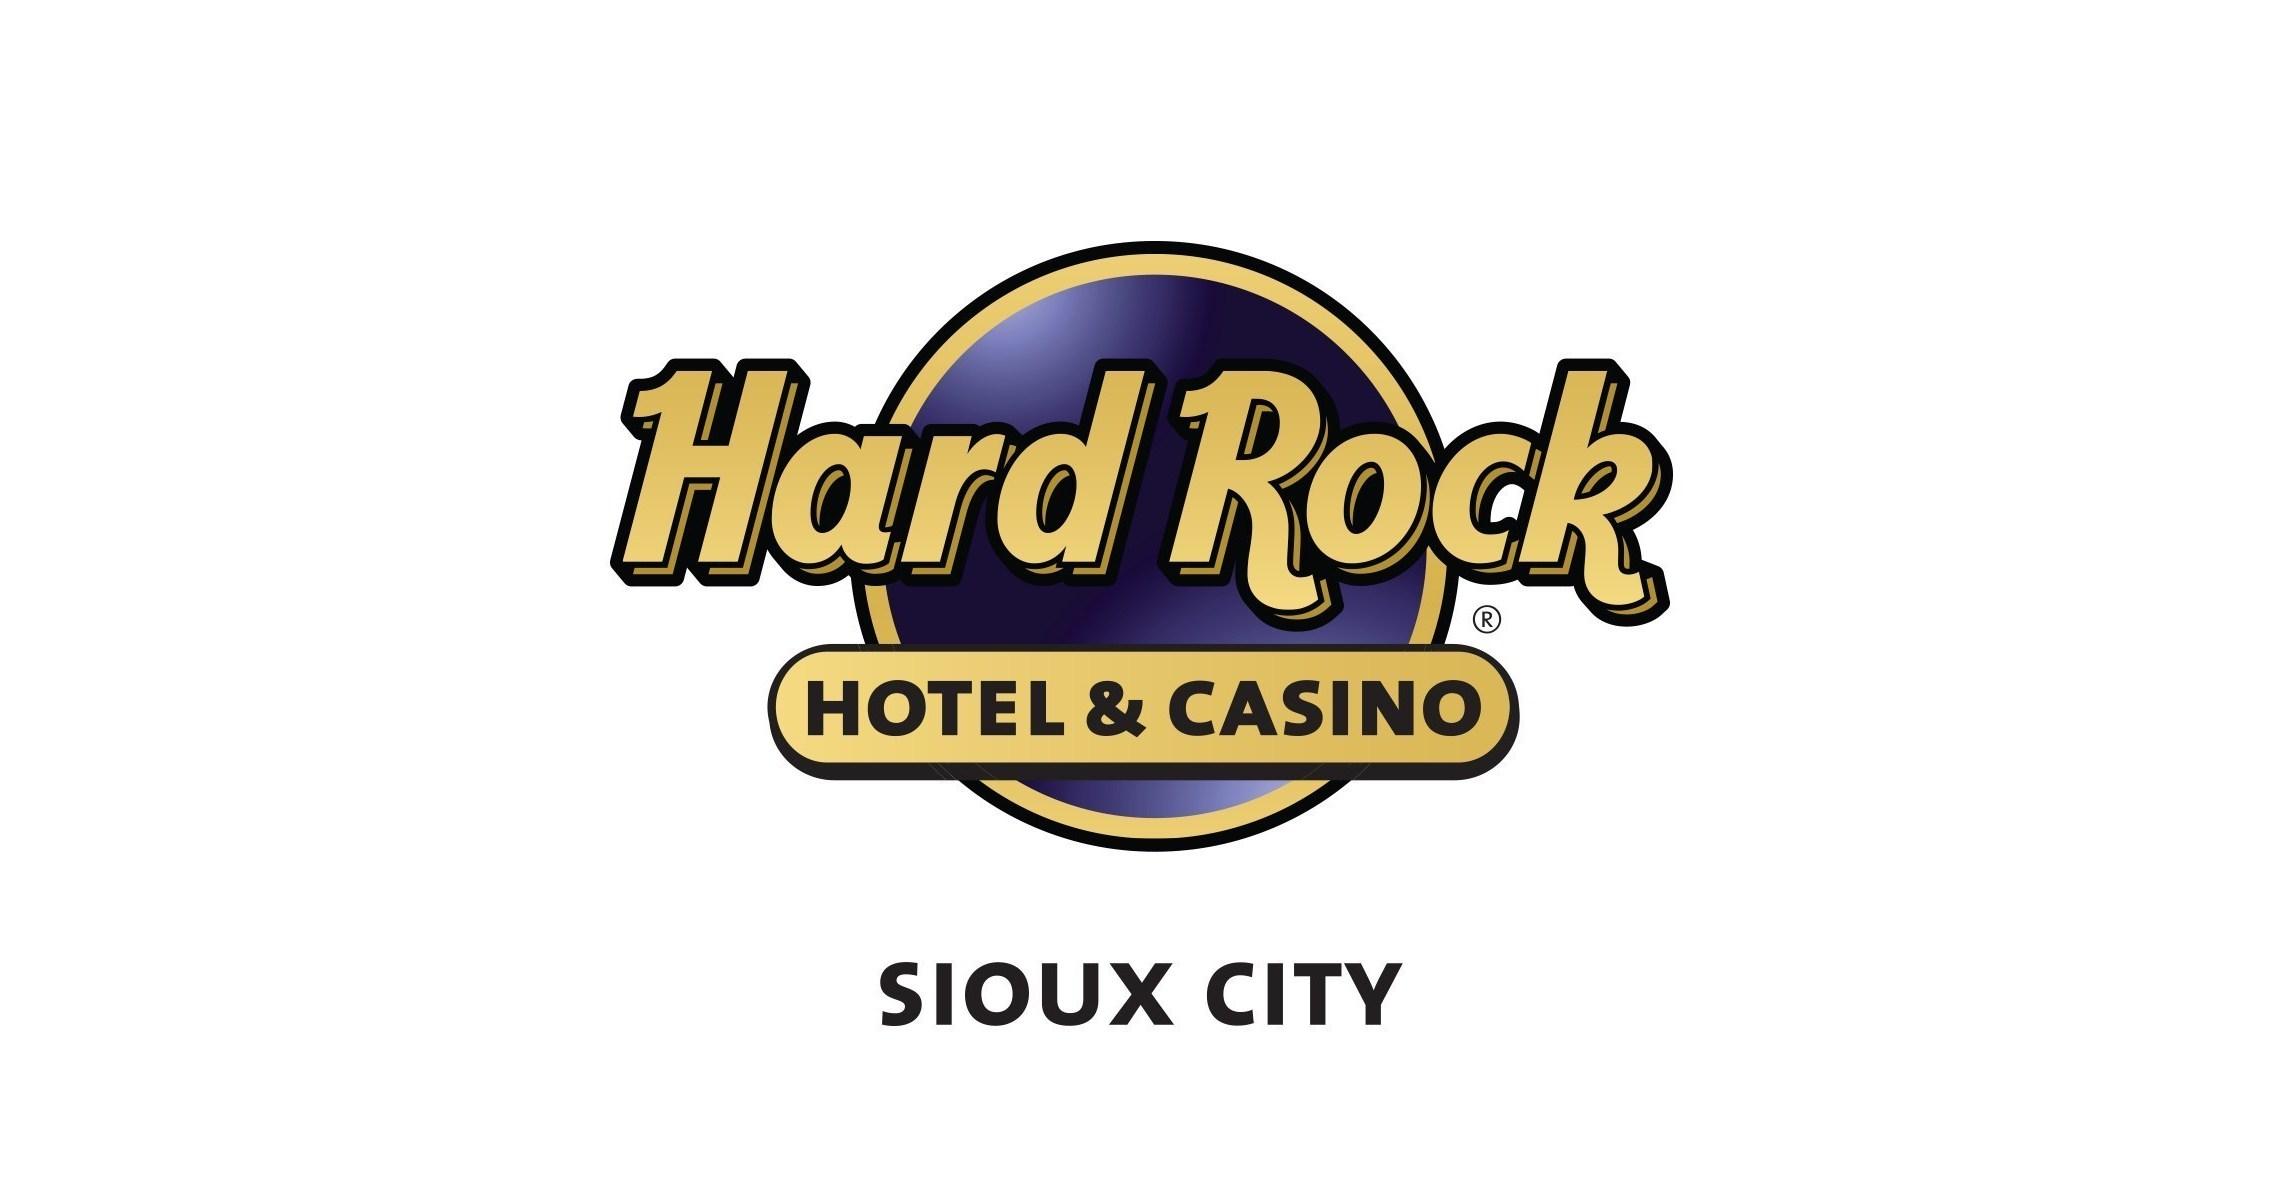 Sioux city casino news